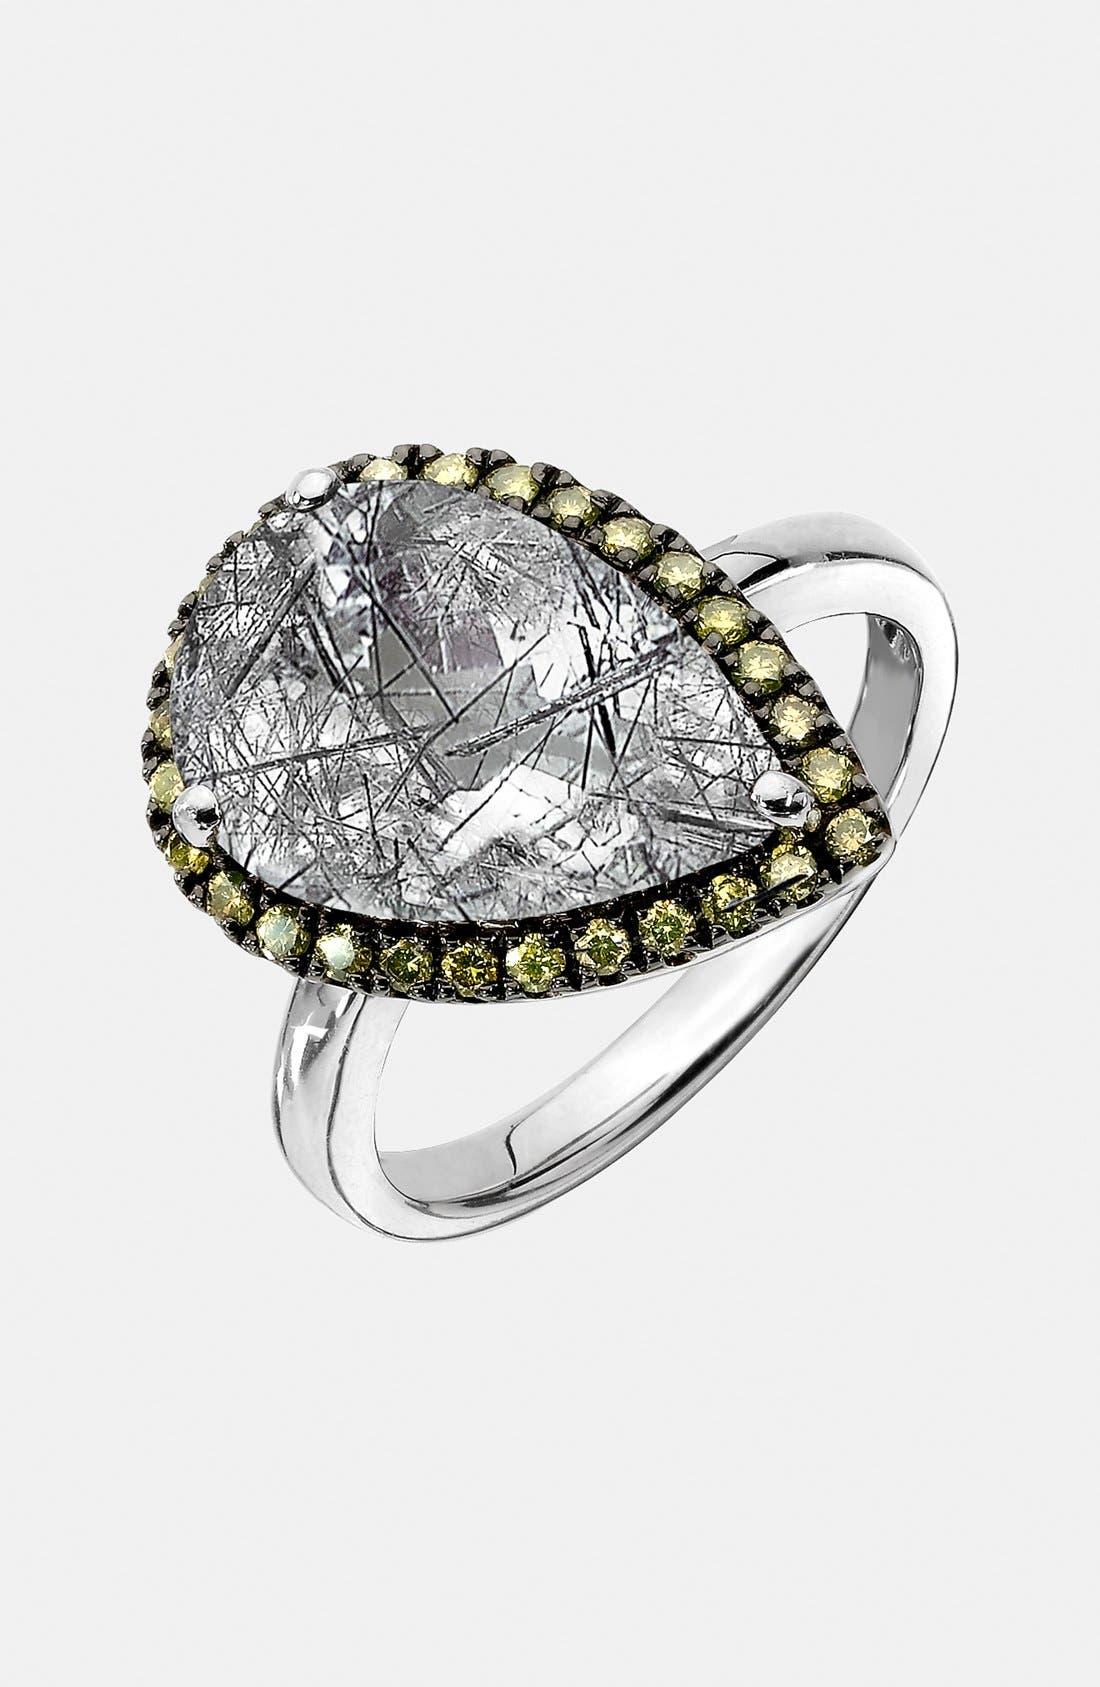 Main Image - Whitney Stern Quartz & Canary Diamond Cocktail Ring